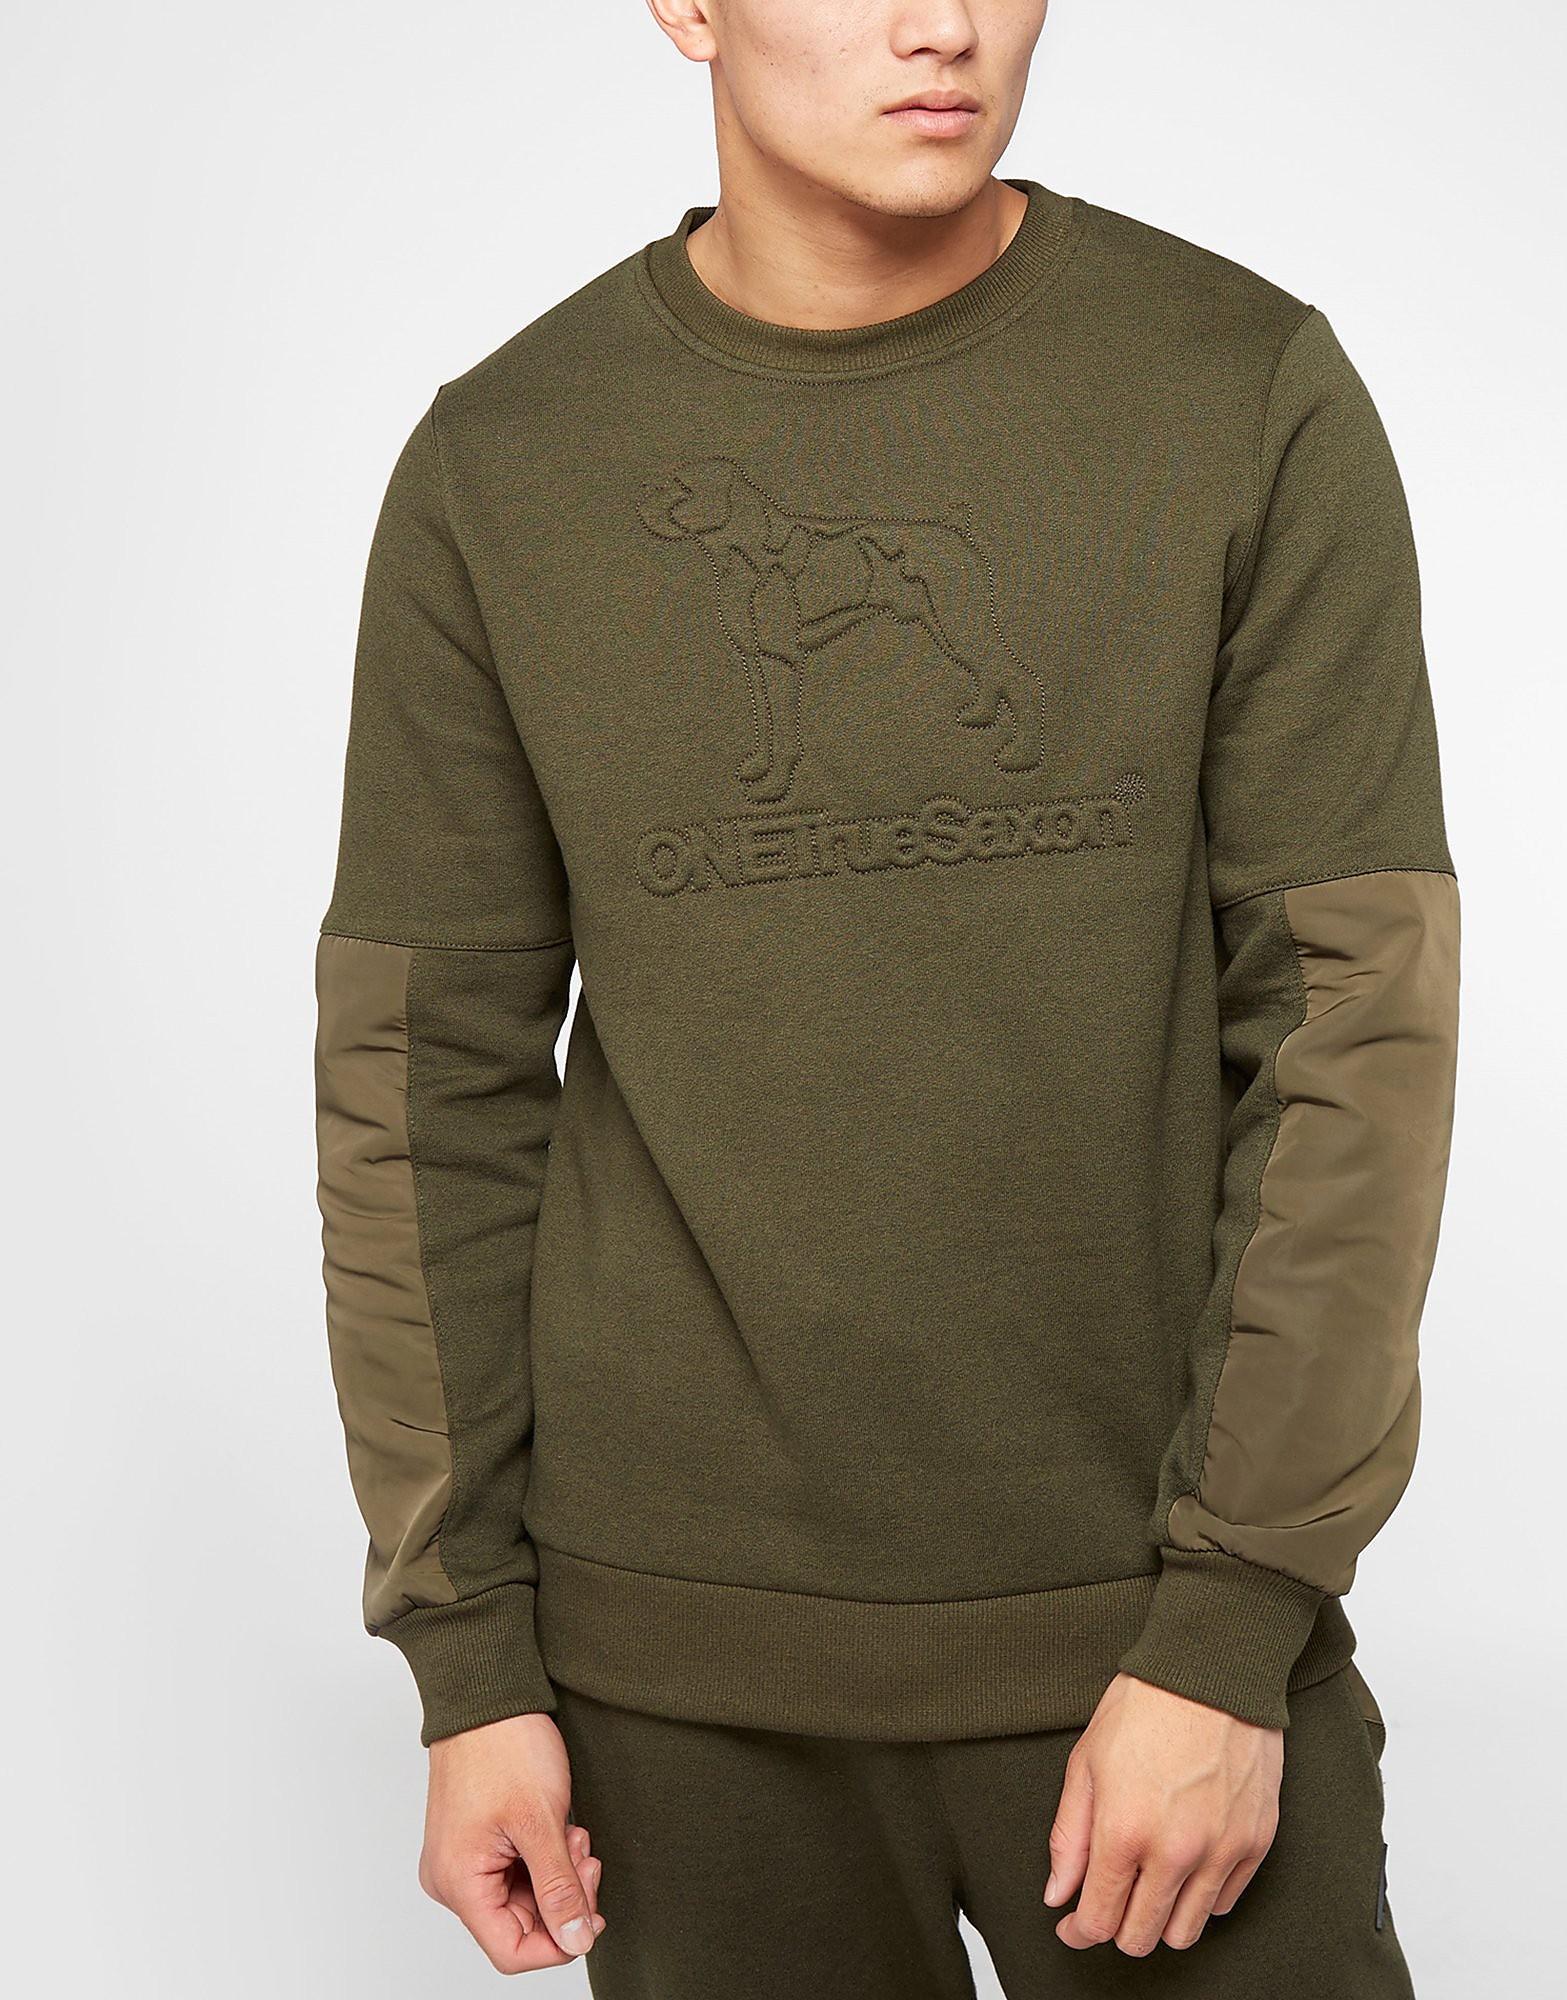 One True Saxon Macomb Crew Sweatshirt - Exclusive